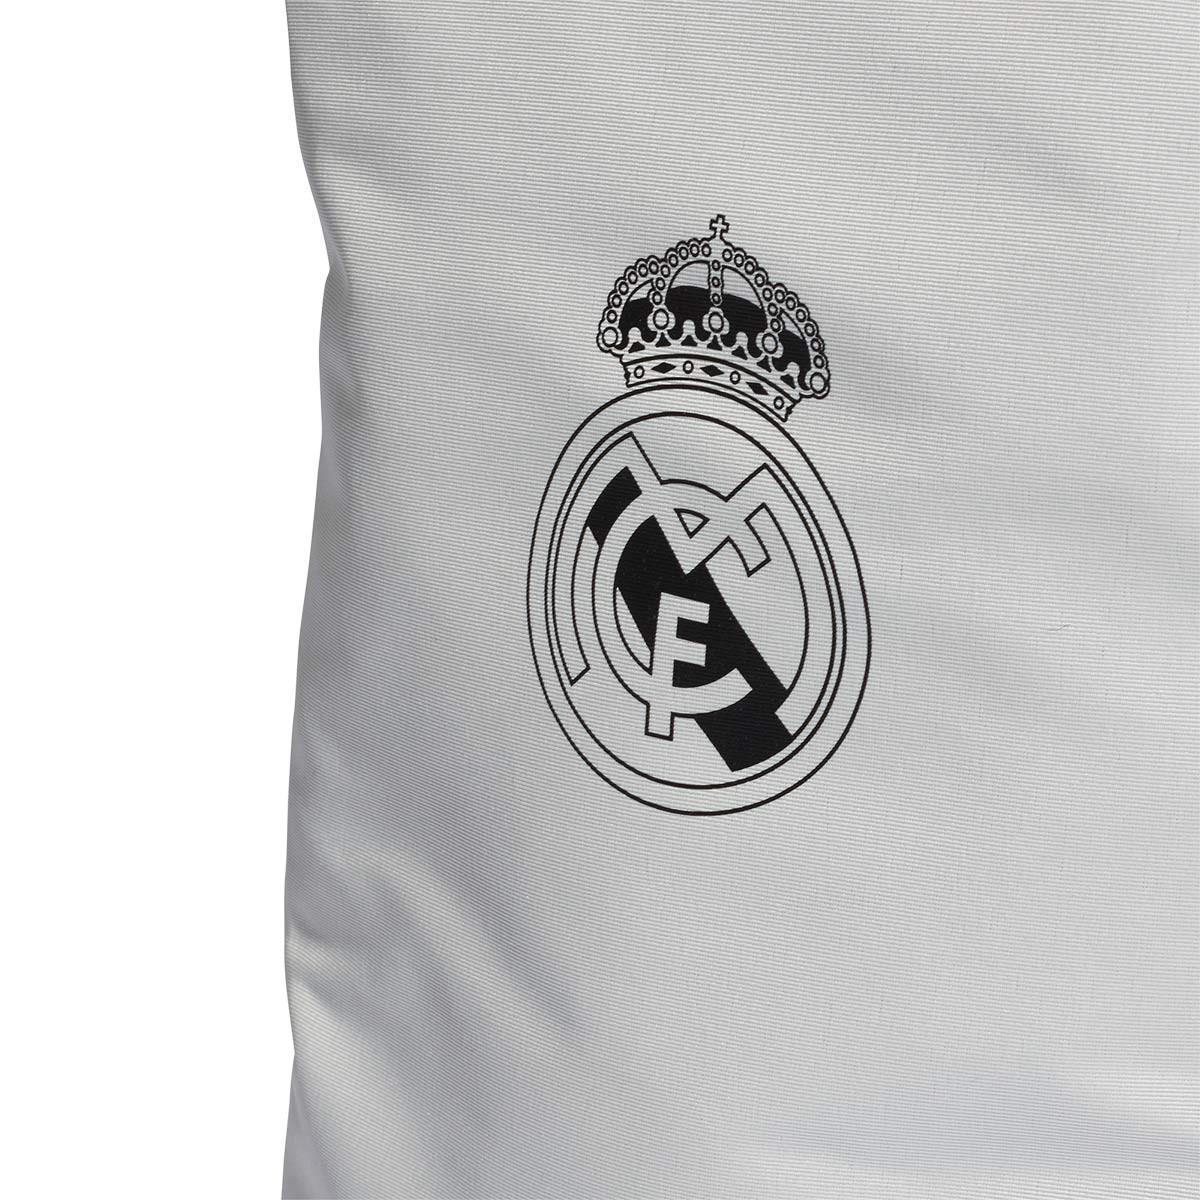 98b2859b3cc Backpack adidas Real Madrid 2018-2019 Core white-Black - Leaked soccer